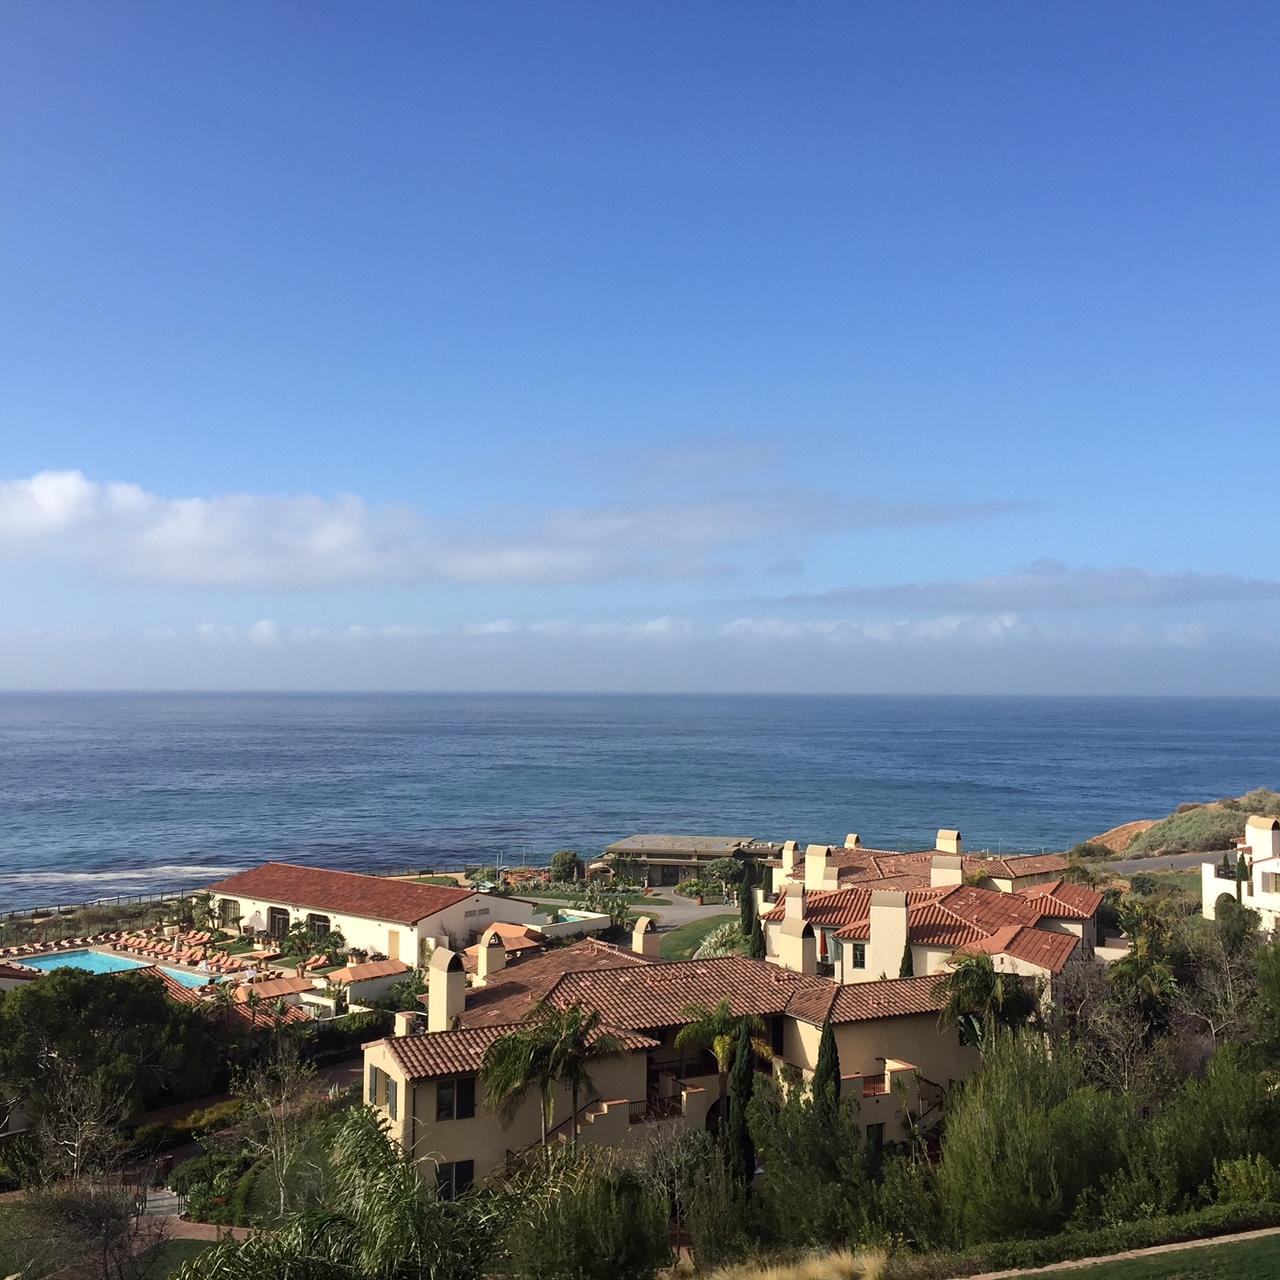 Work trip to Terranea Resort outside of L.A.